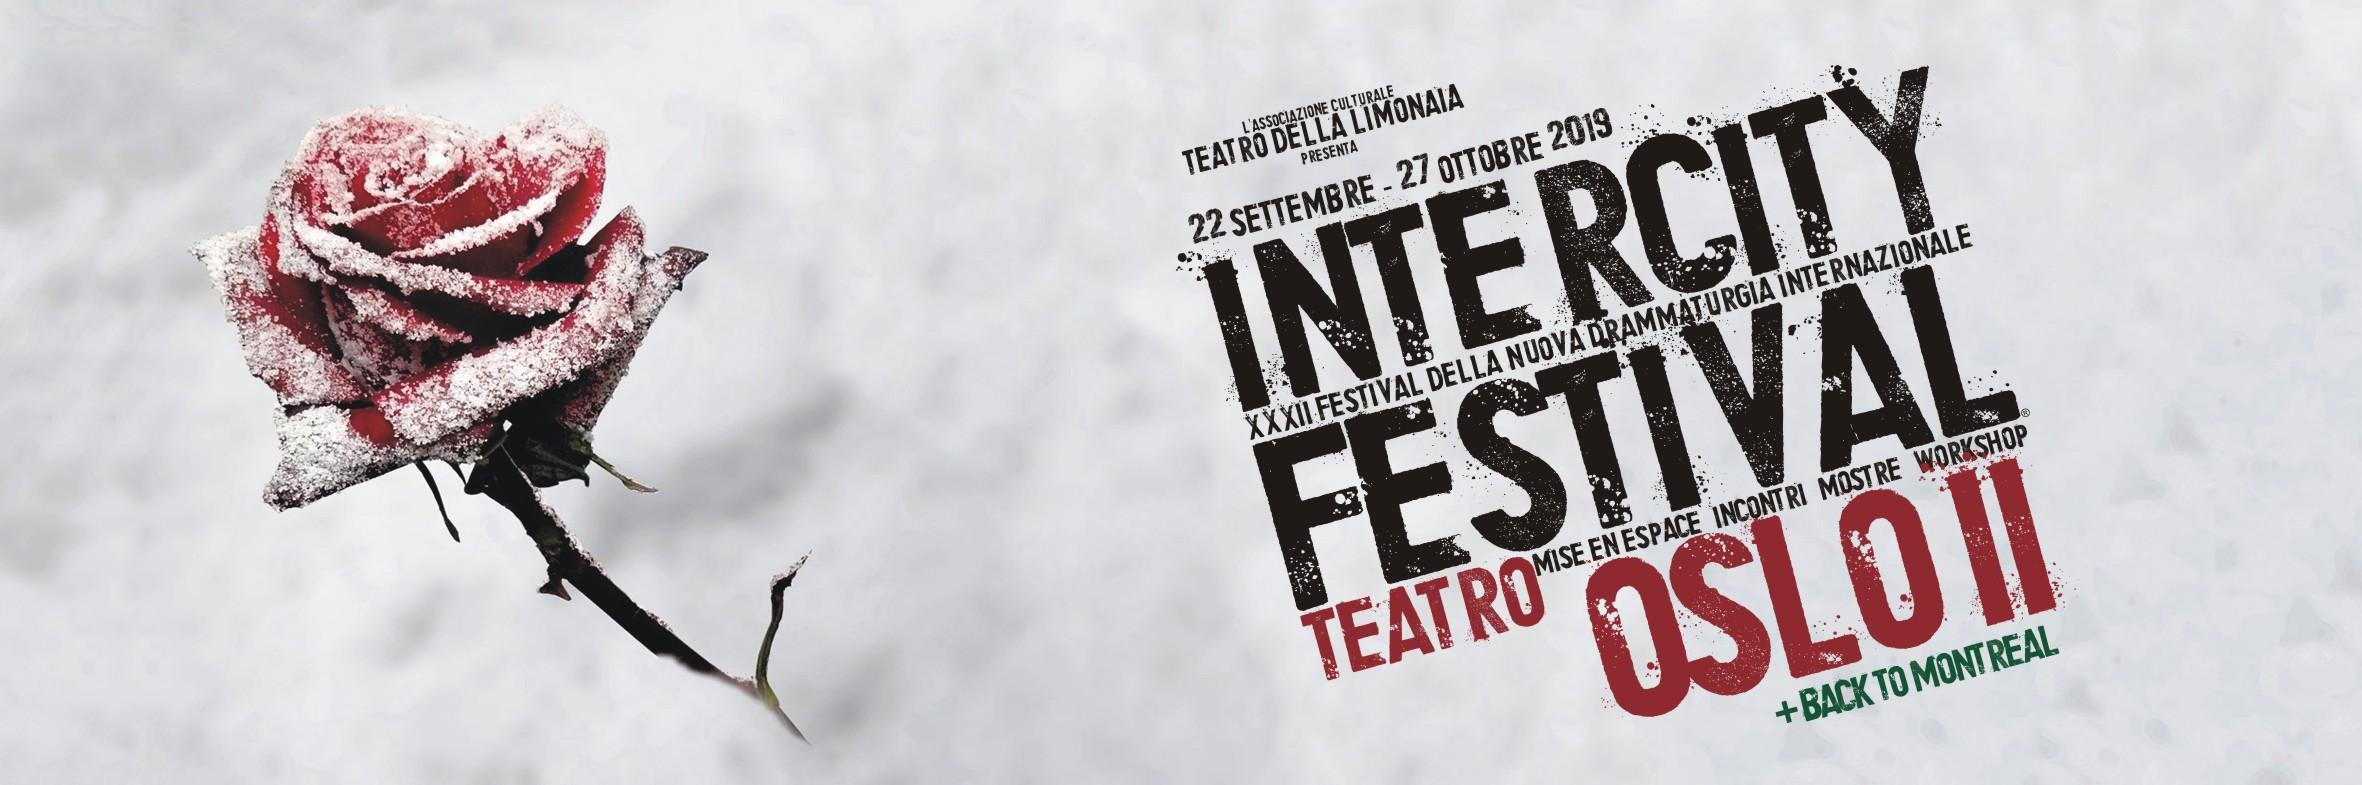 Intercity Festival 2019